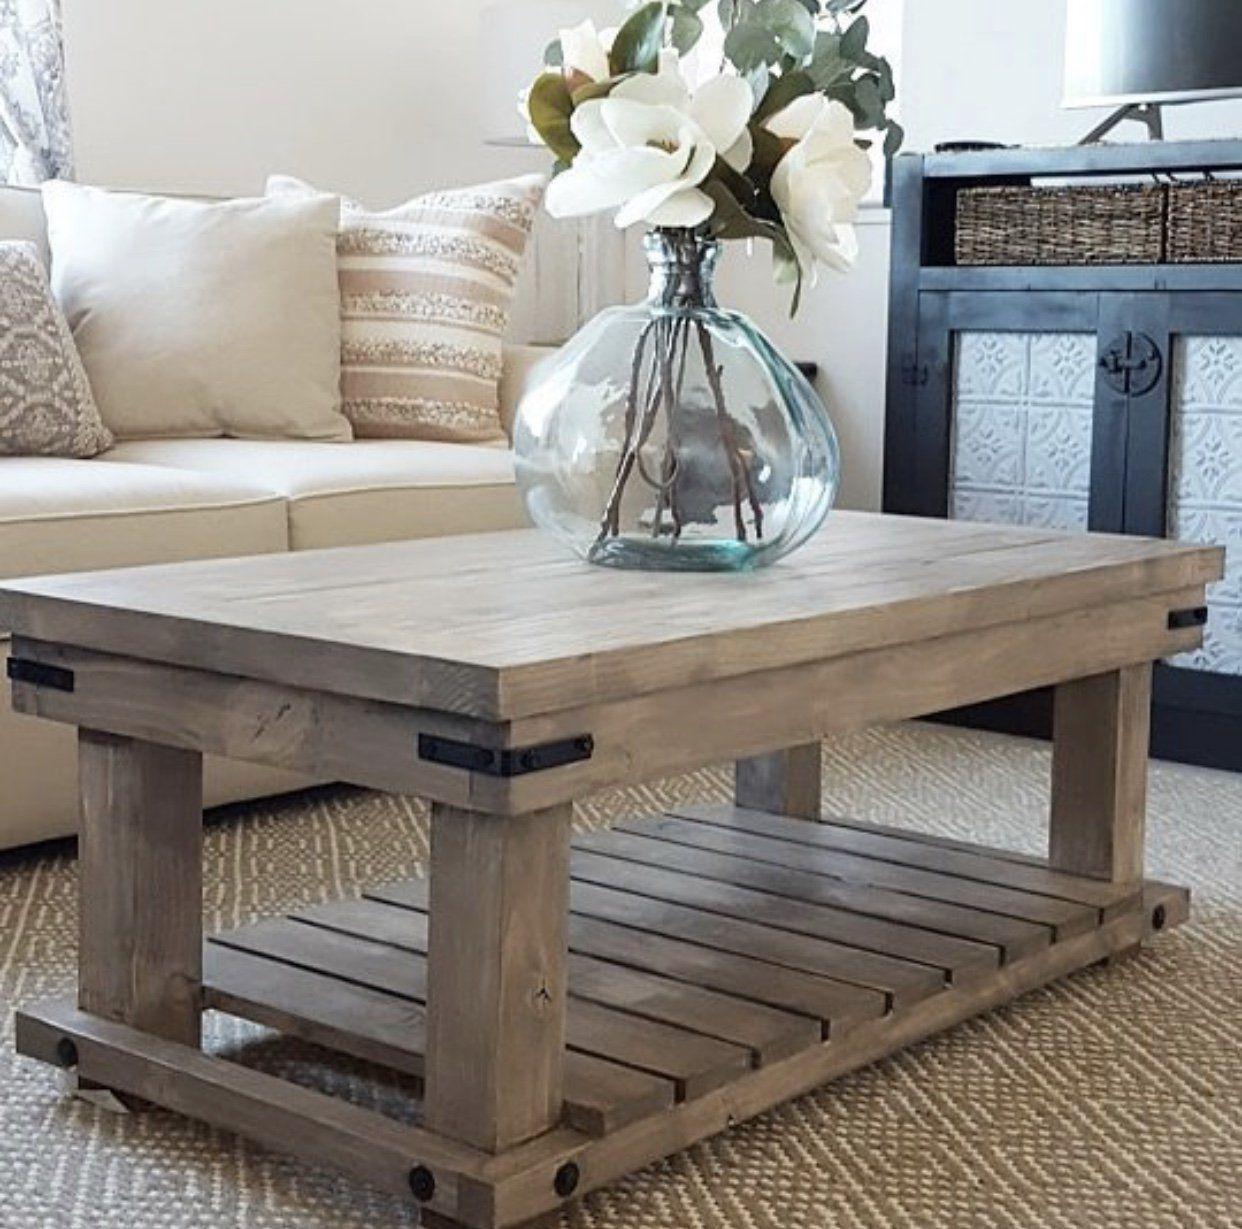 Diy industrial coffee table coffee table farmhouse